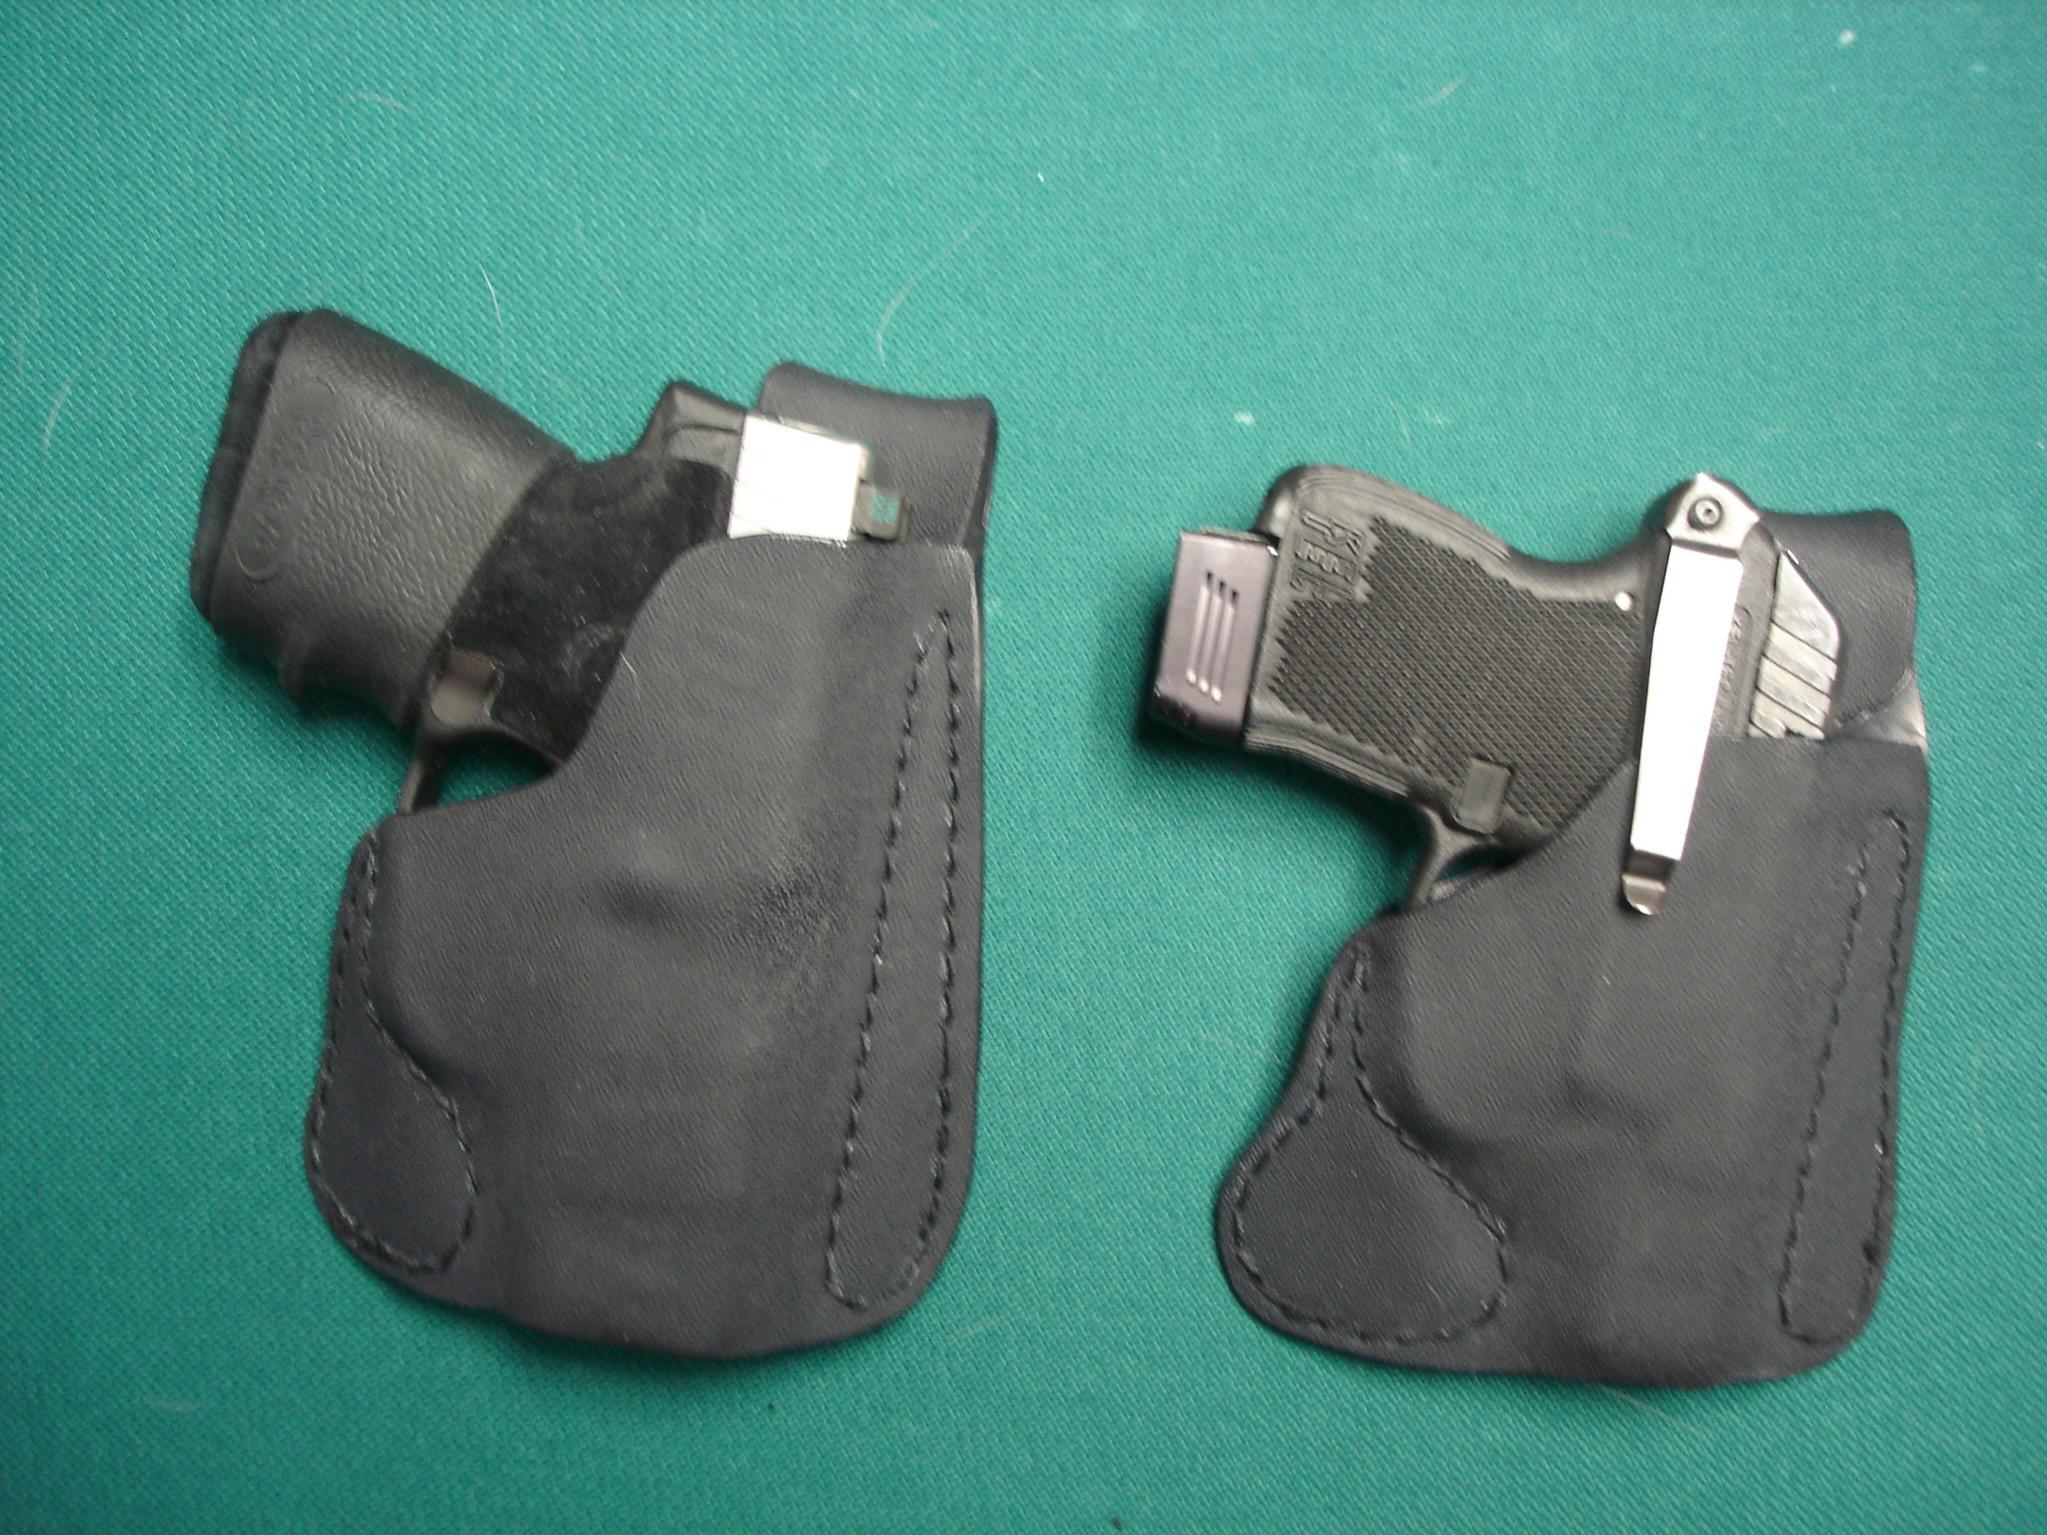 FIST kydex pocket holsters.-dsc00098.jpg